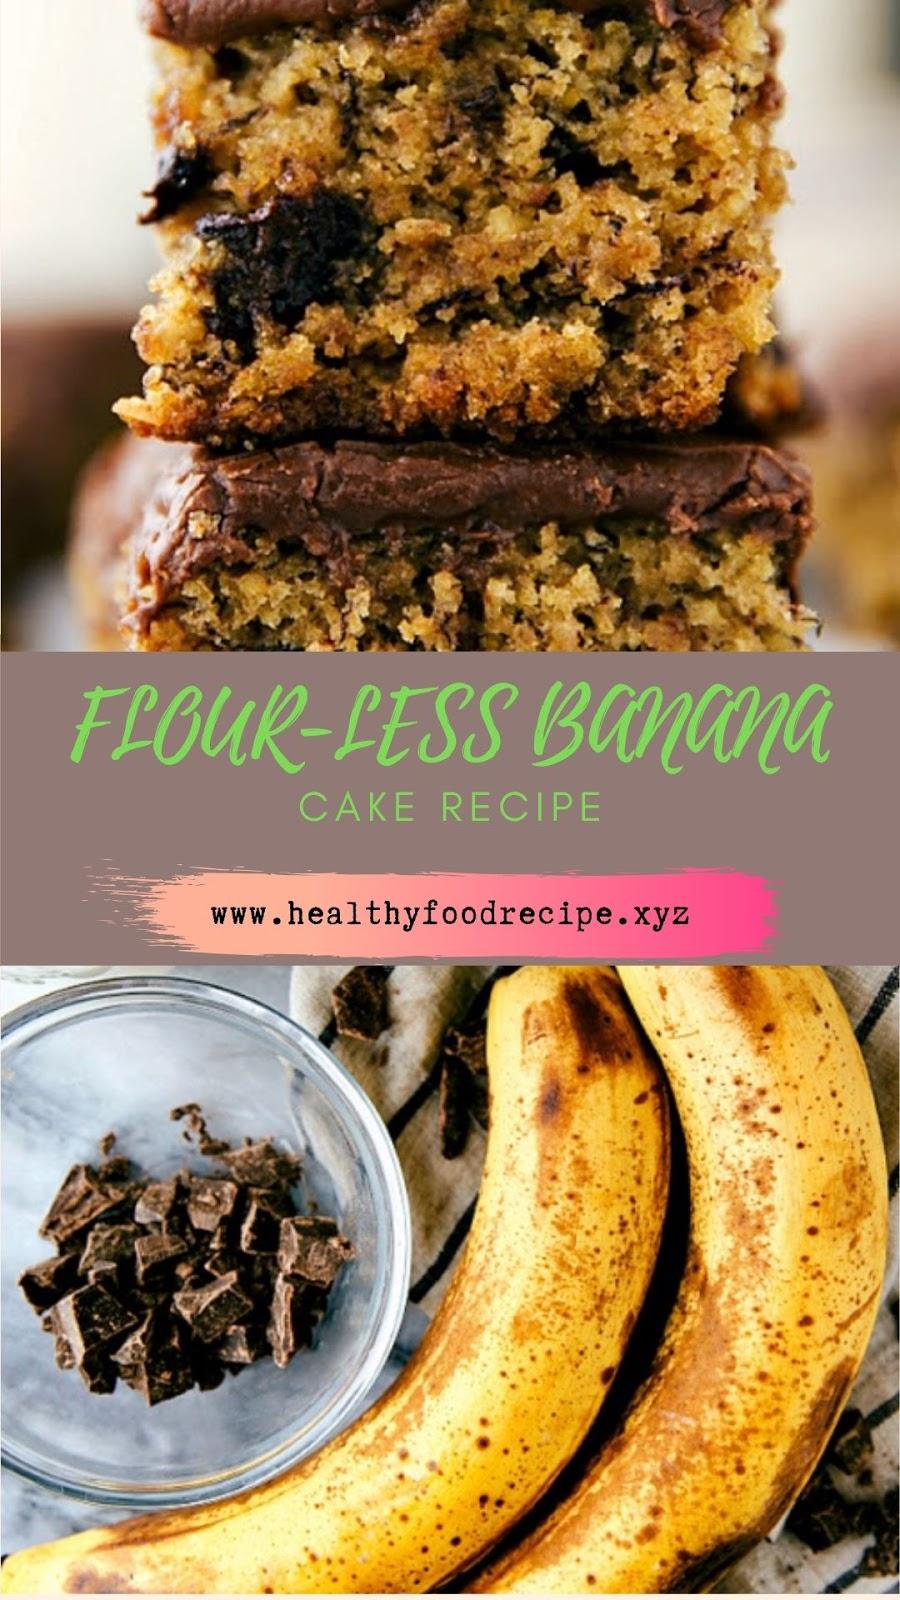 FLOUR-LESS BANANA CAKE RECIPE